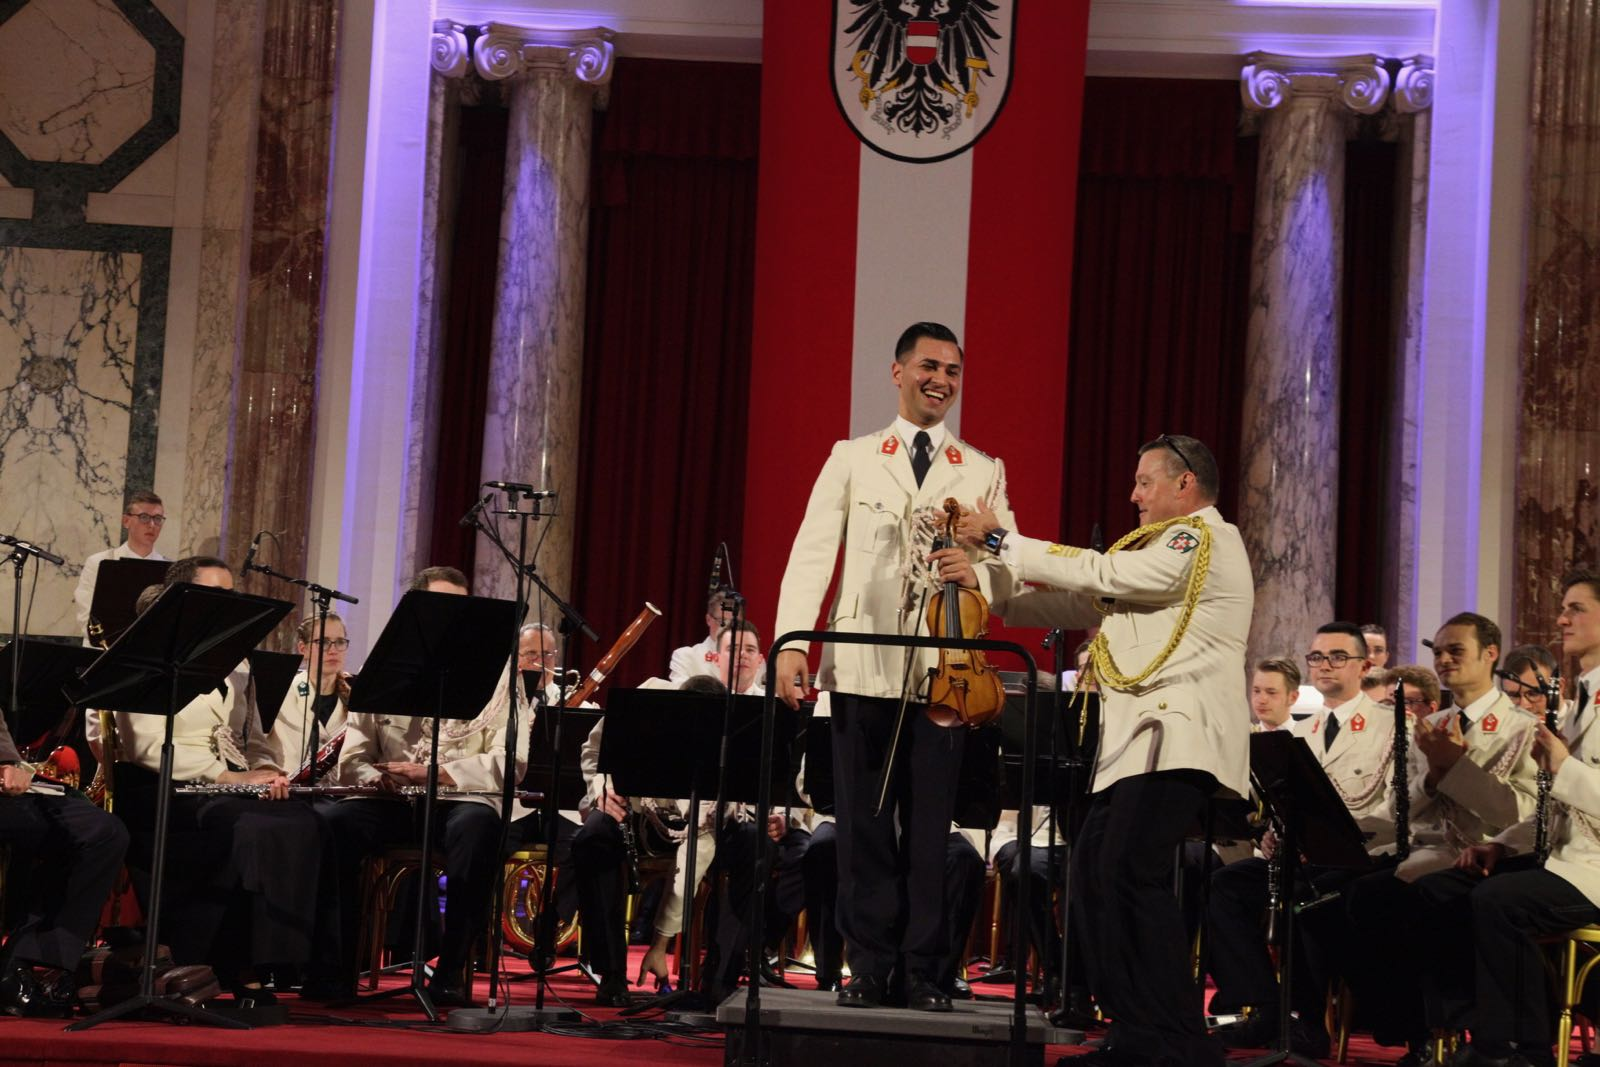 2019_03_14Gardemusik_Frühjahrskonzert_HBP_Hofburg - 99 of 177